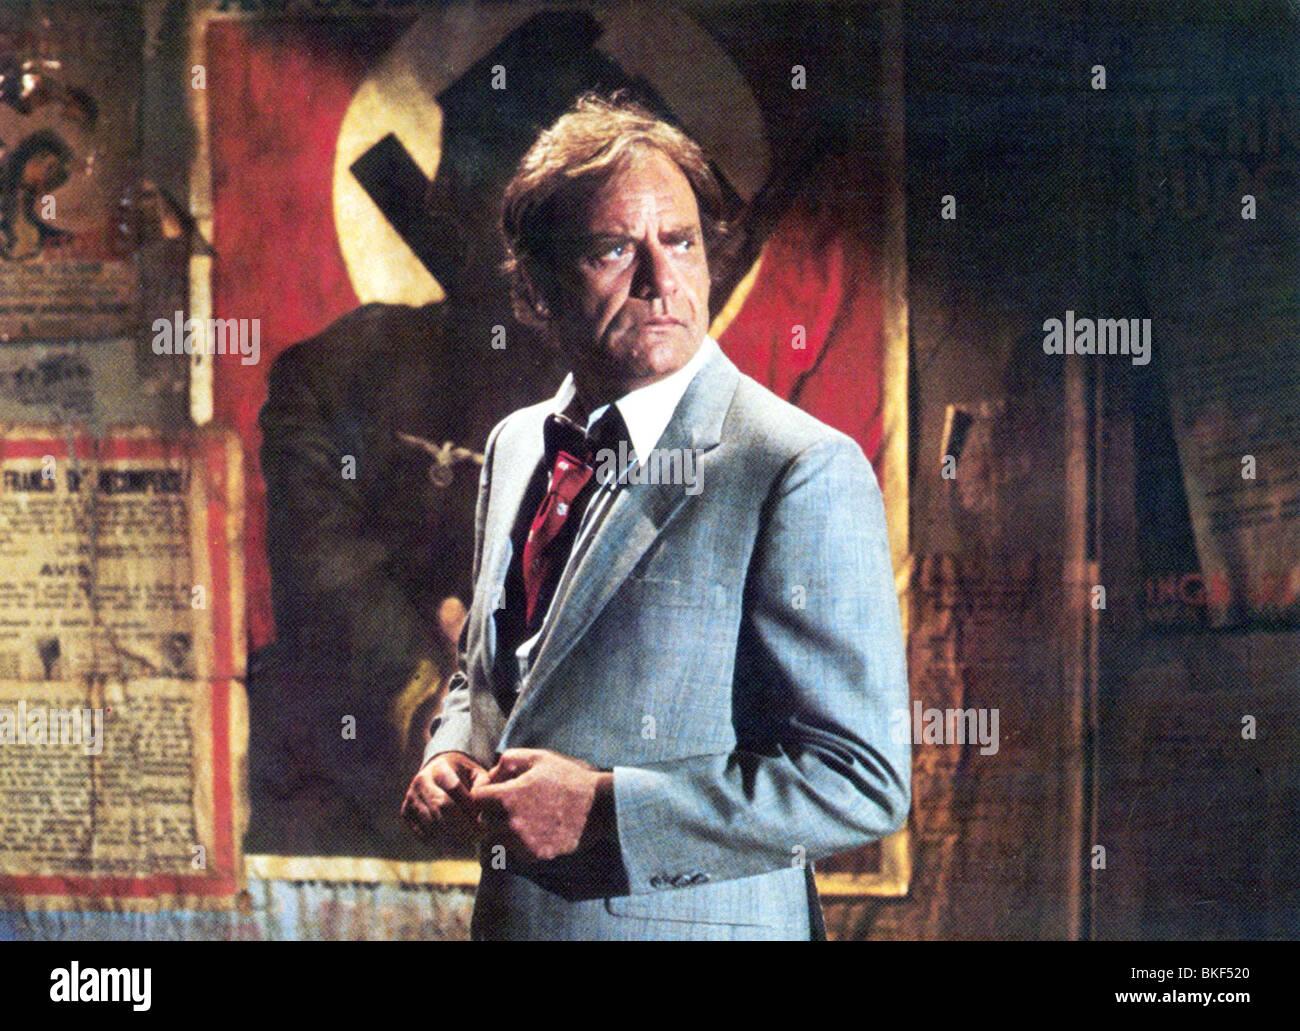 TWILIGHT ZONE: THE MOVIE (1983) VIC MORROW TWZO 006FOH - Stock Image